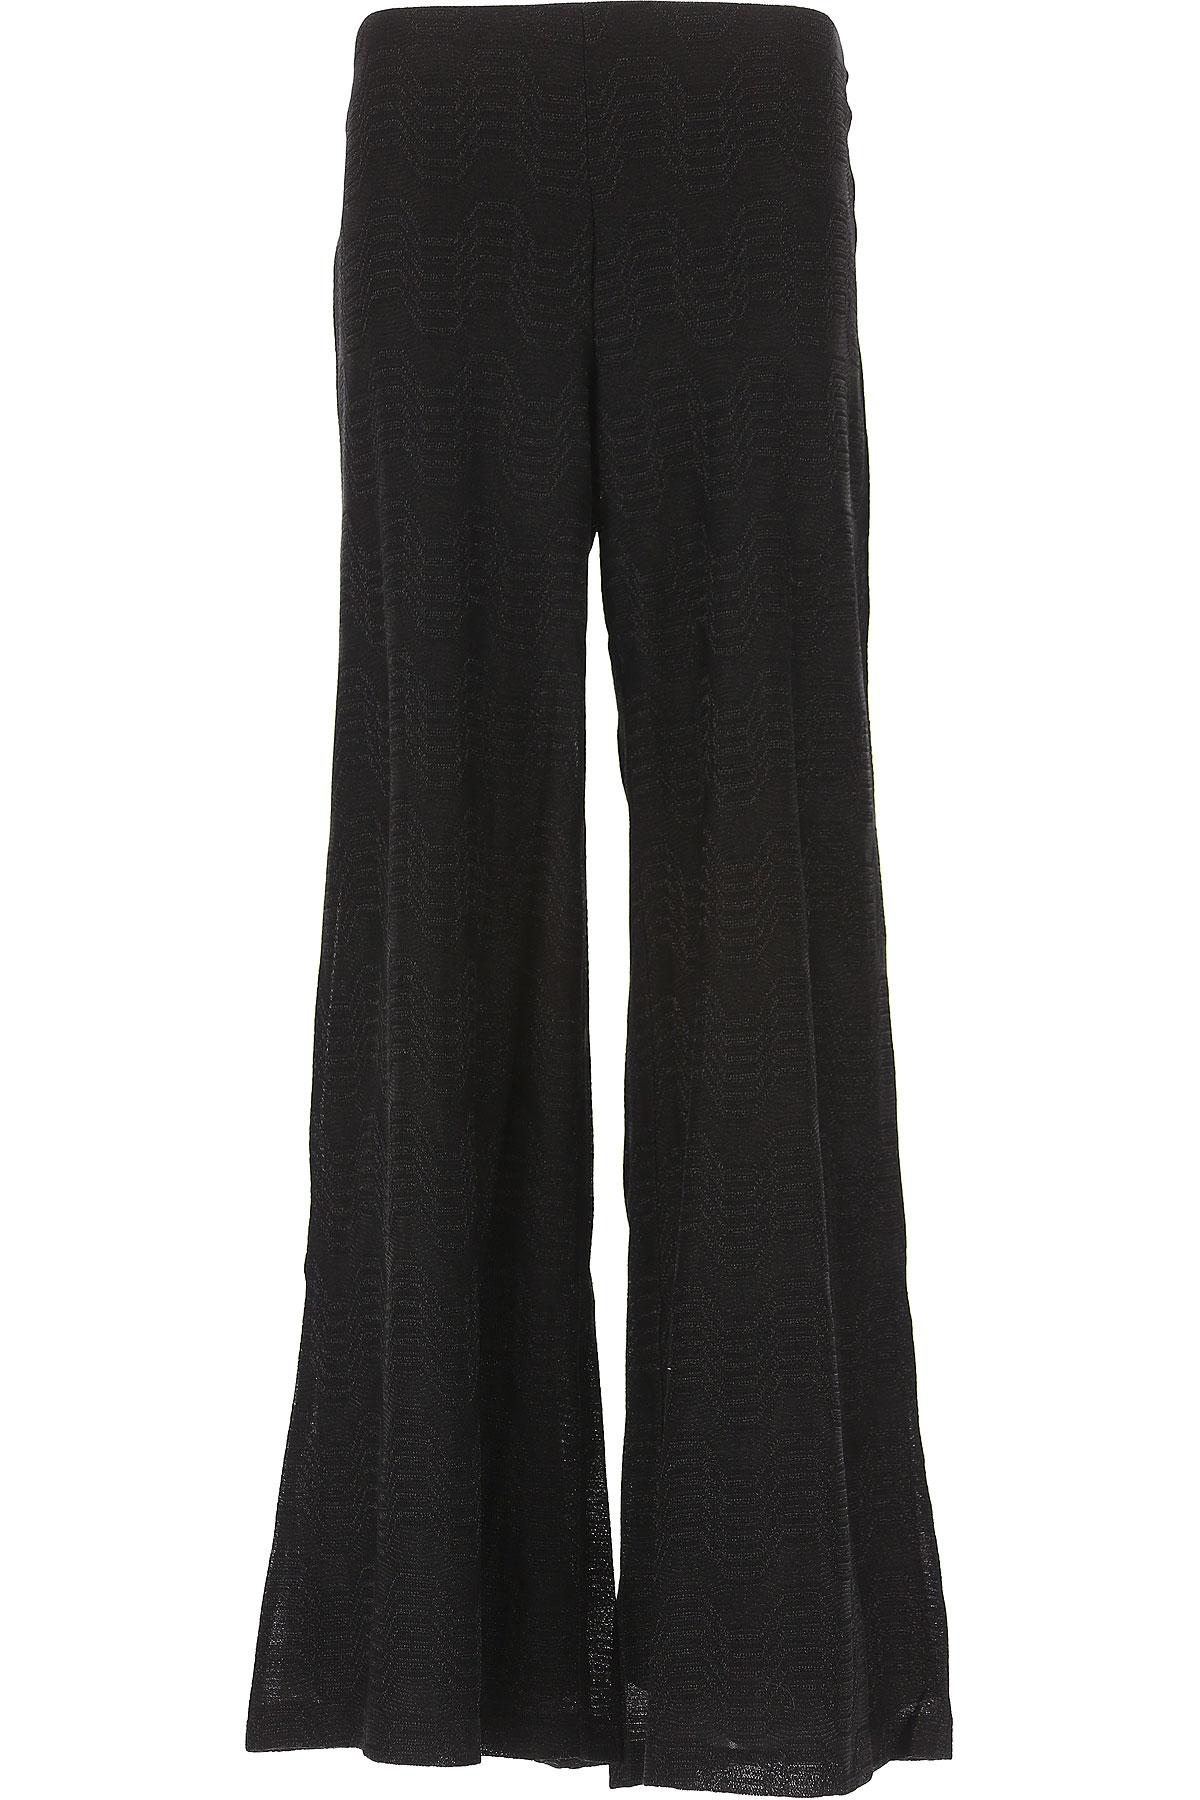 Missoni Pantalon Femme, Noir, Polyester, 2017, 40 42